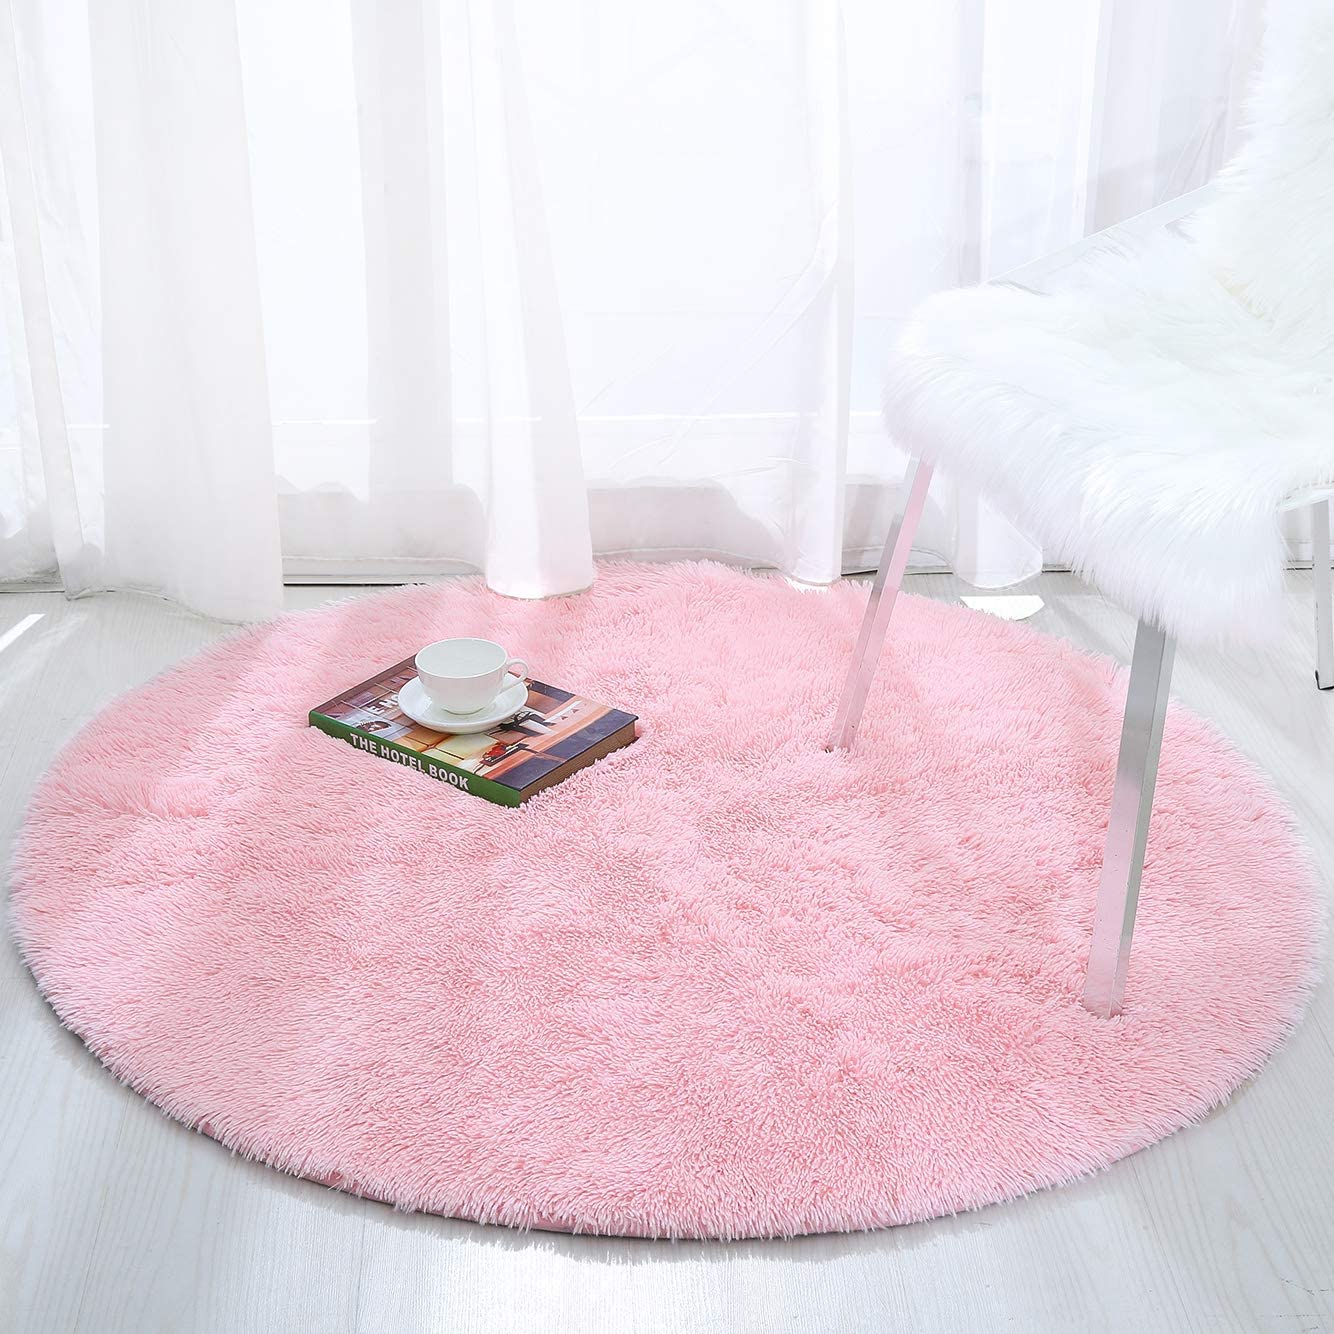 Softlife Fluffy Soft Round Bedroom Rugs 4 x 4 Feet Shaggy Circle Area Rug for Girls Boys Kids Room Nursery Princess Castle Living Room Home Decor Circular Floor Carpet, Pink